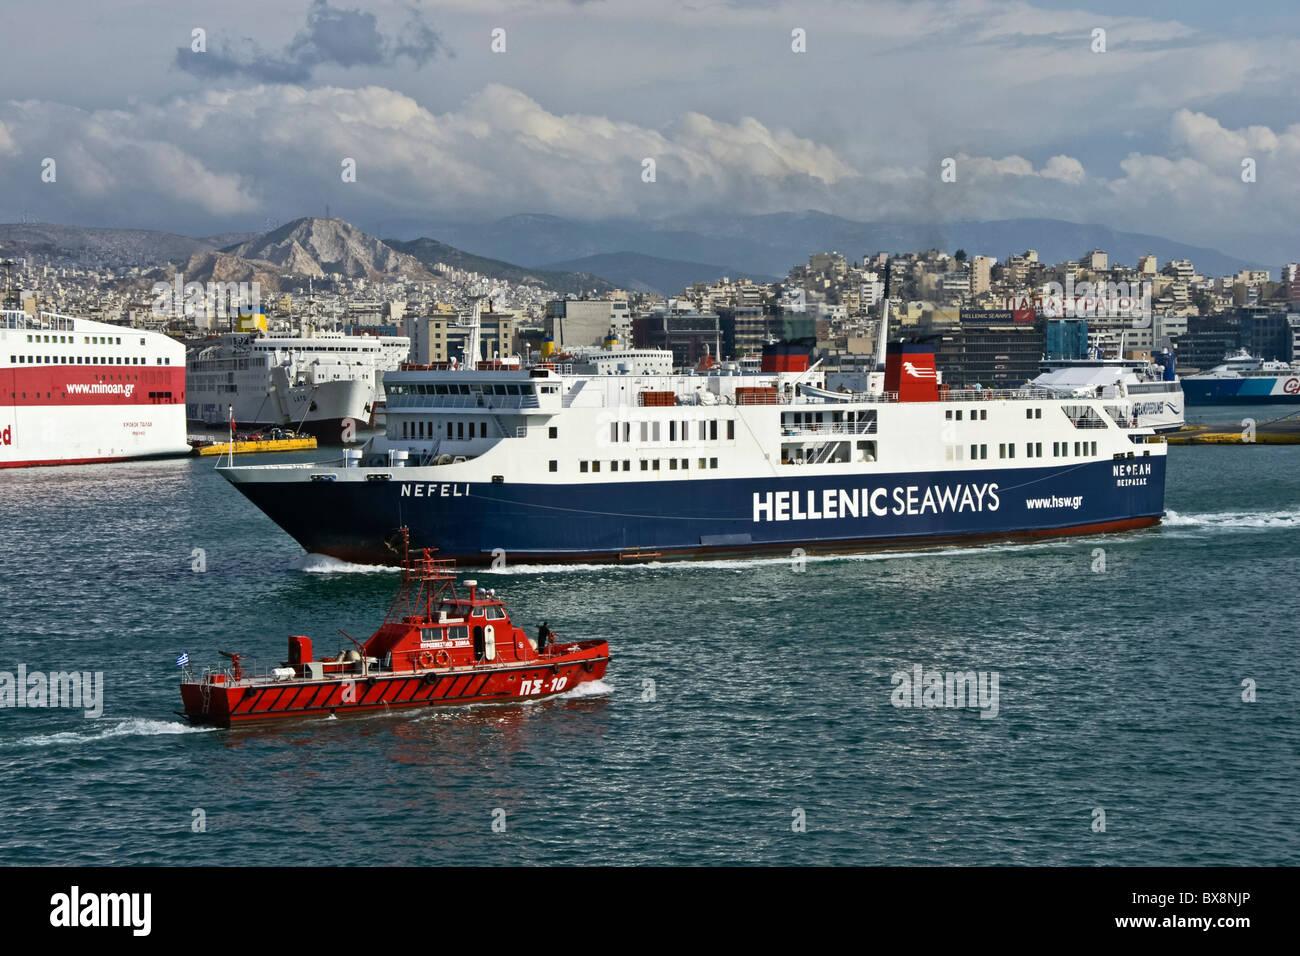 Hellenic Seaways car and passenger ferry Nefeli leaving Piraeus harbour in Greece - Stock Image